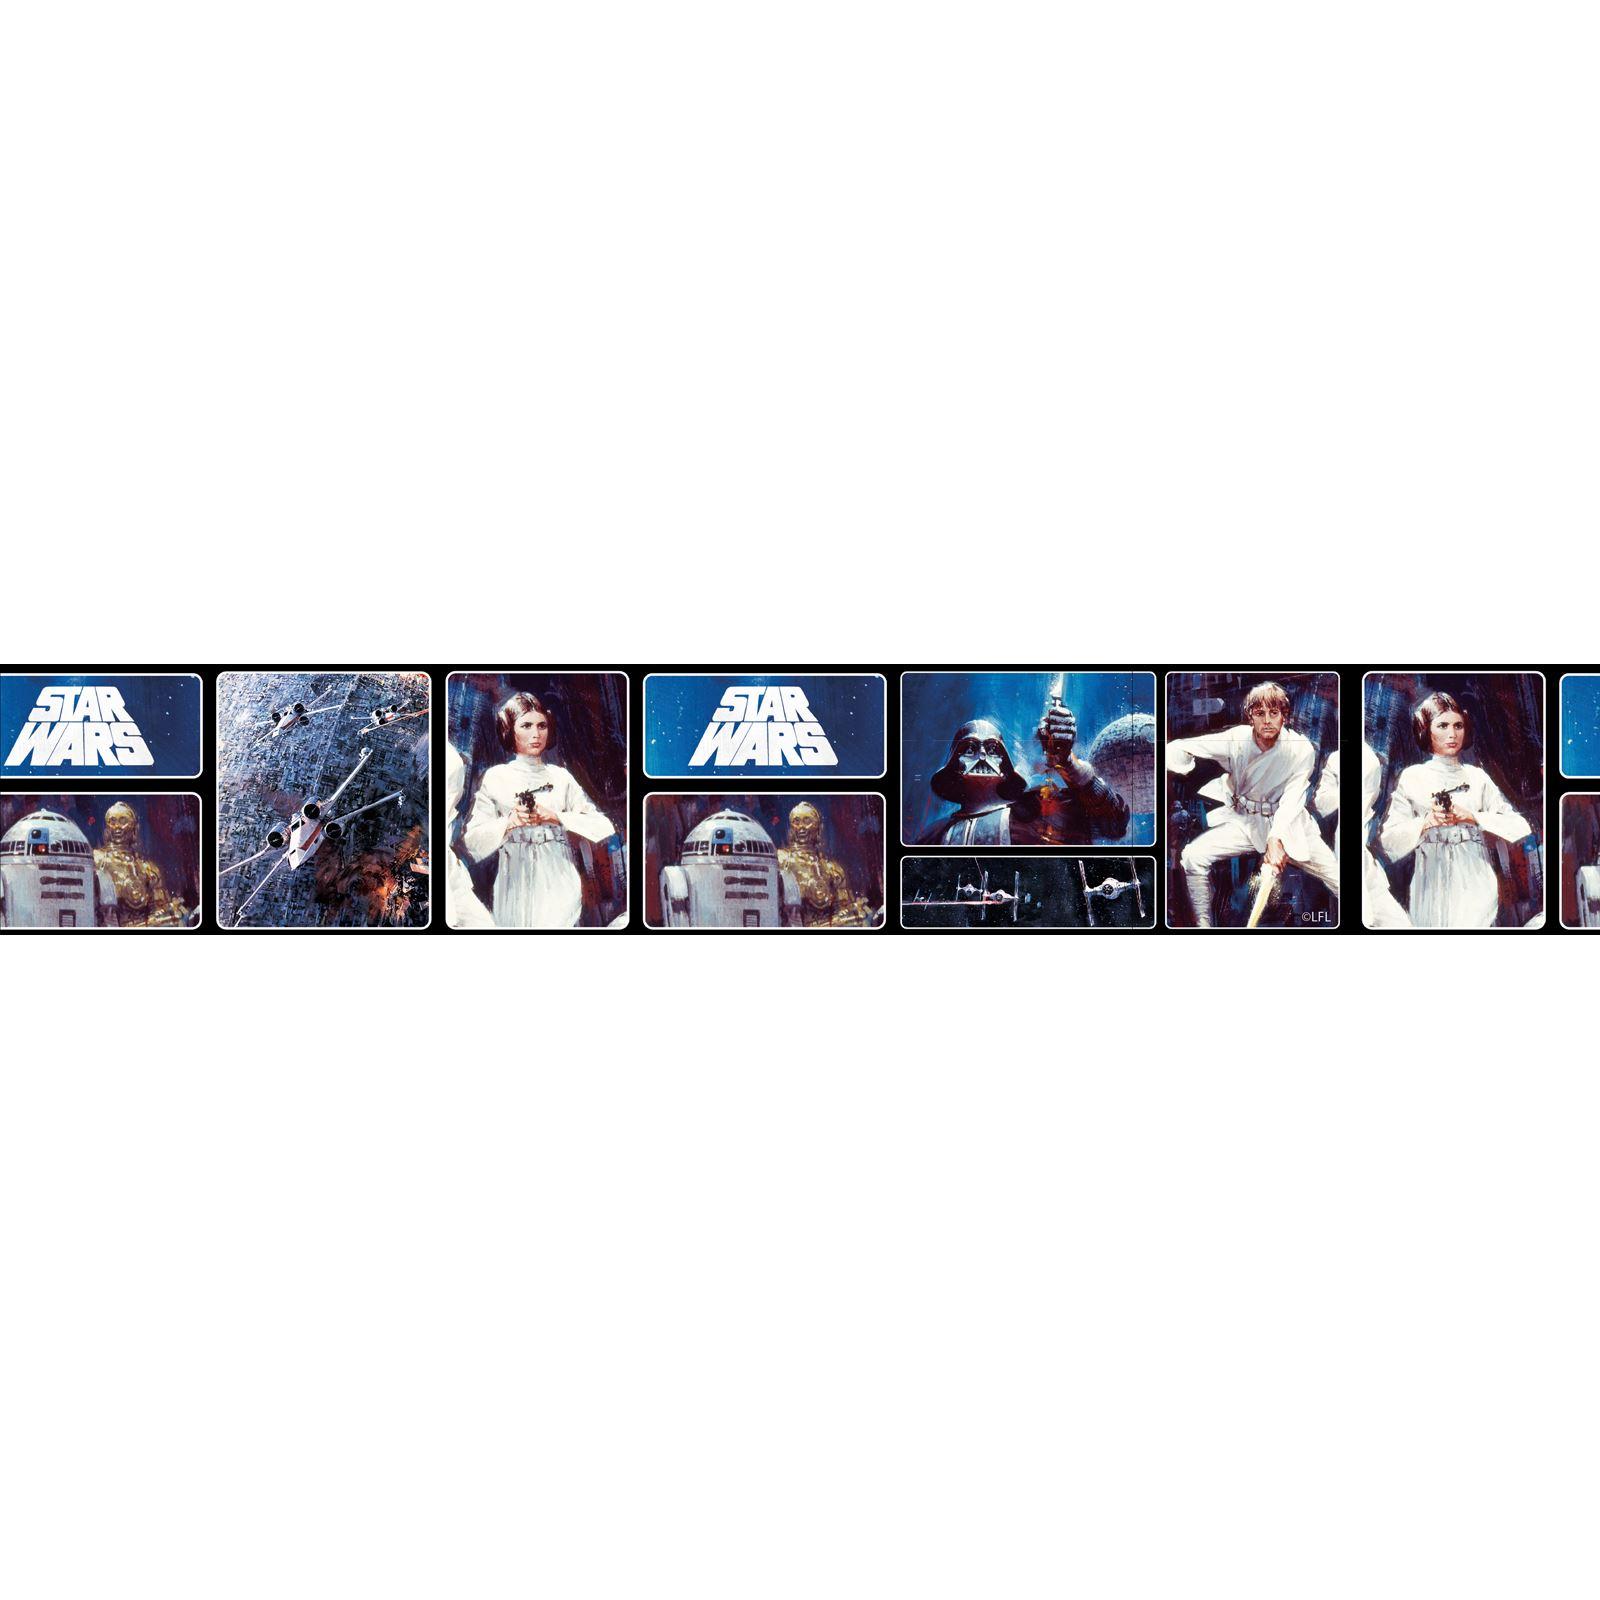 star wars wallpaper borders 5m various styles designs new kids